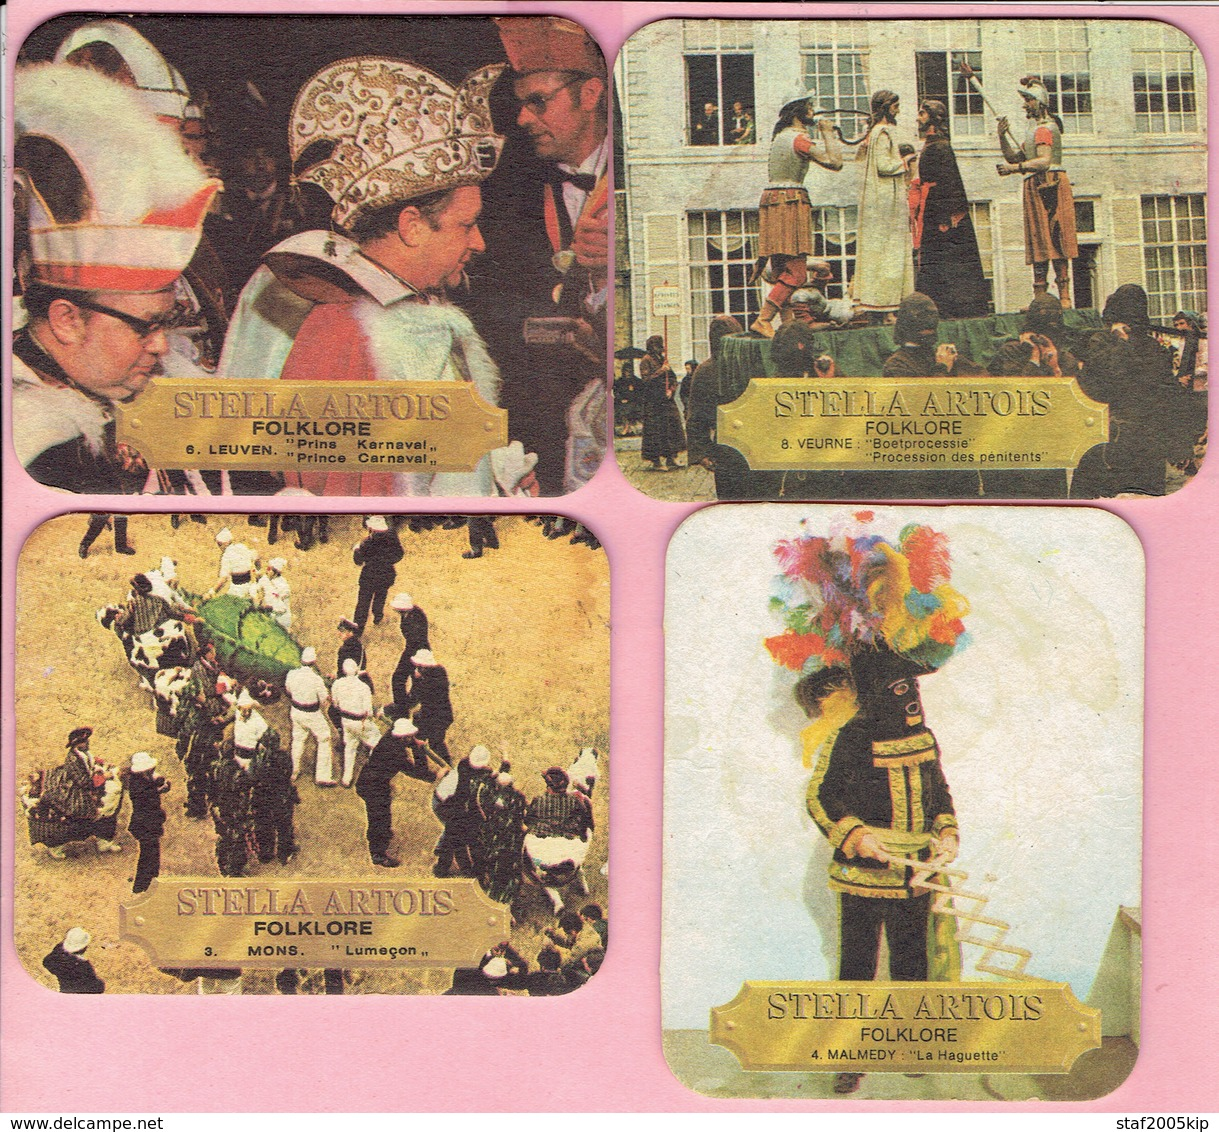 Bierviltjes - Stella Artois - Folklore - Mons-Malmedy-Leuven-Veurne - (4 Stuks) - Sous-bocks